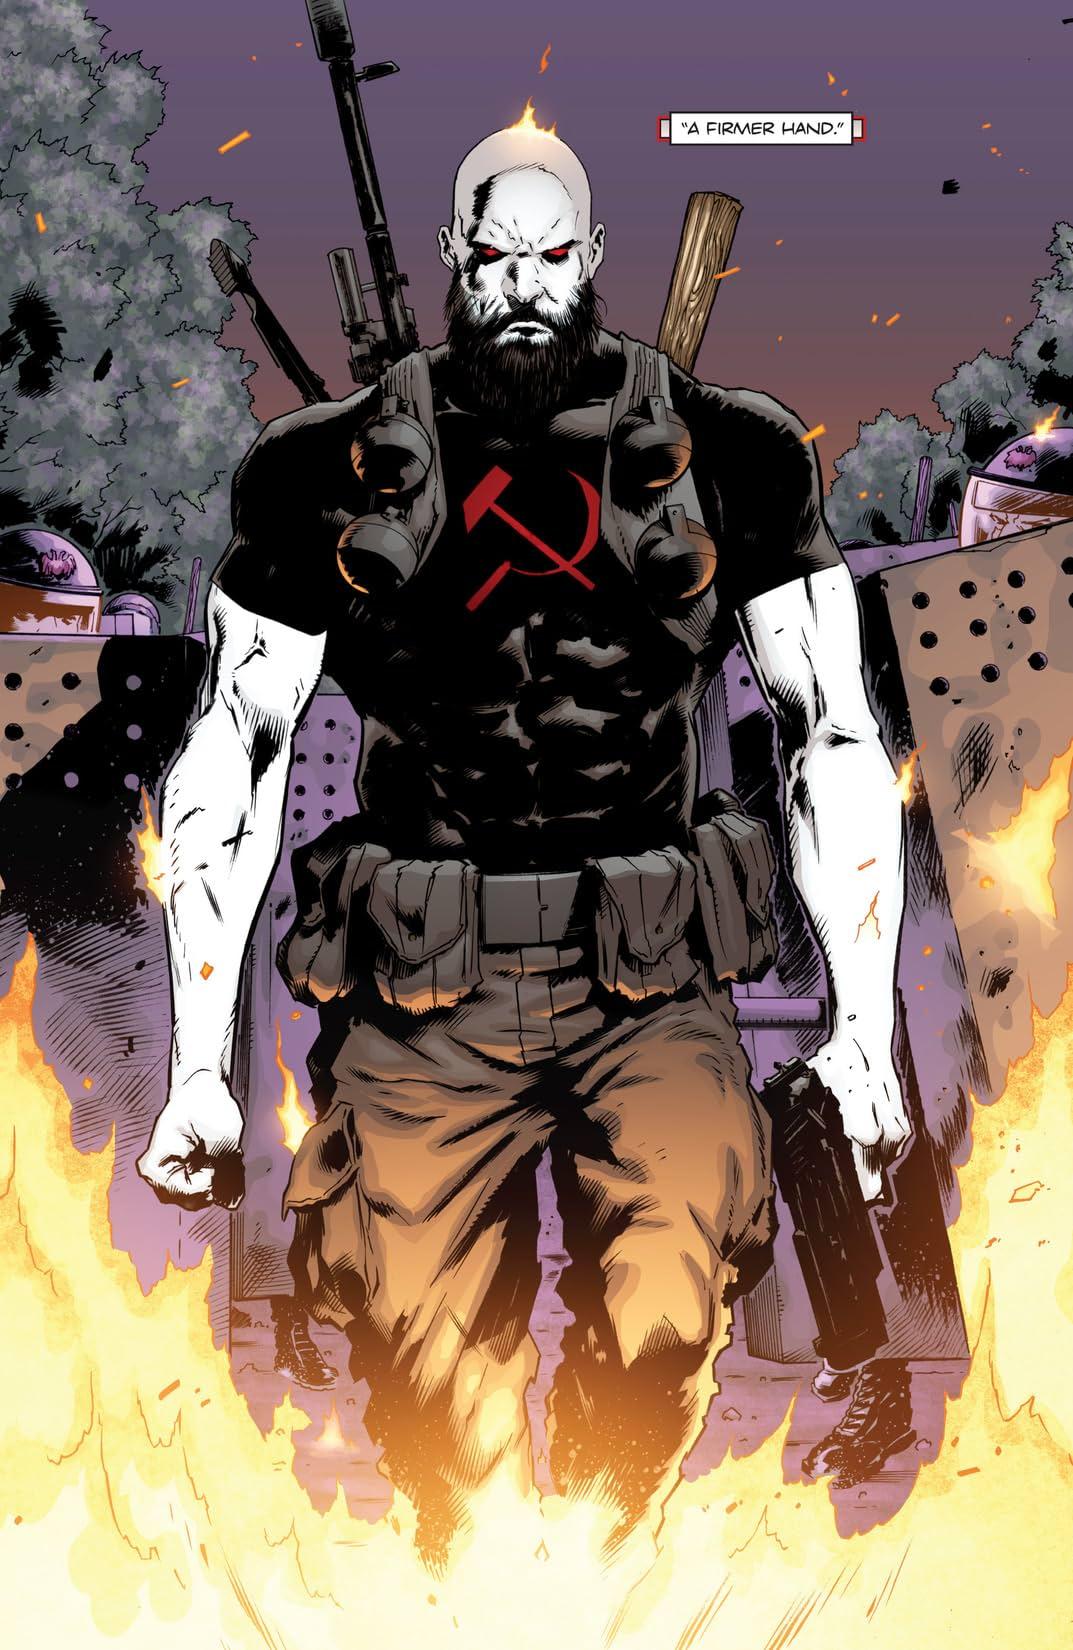 Divinity III: Stalinverse #1